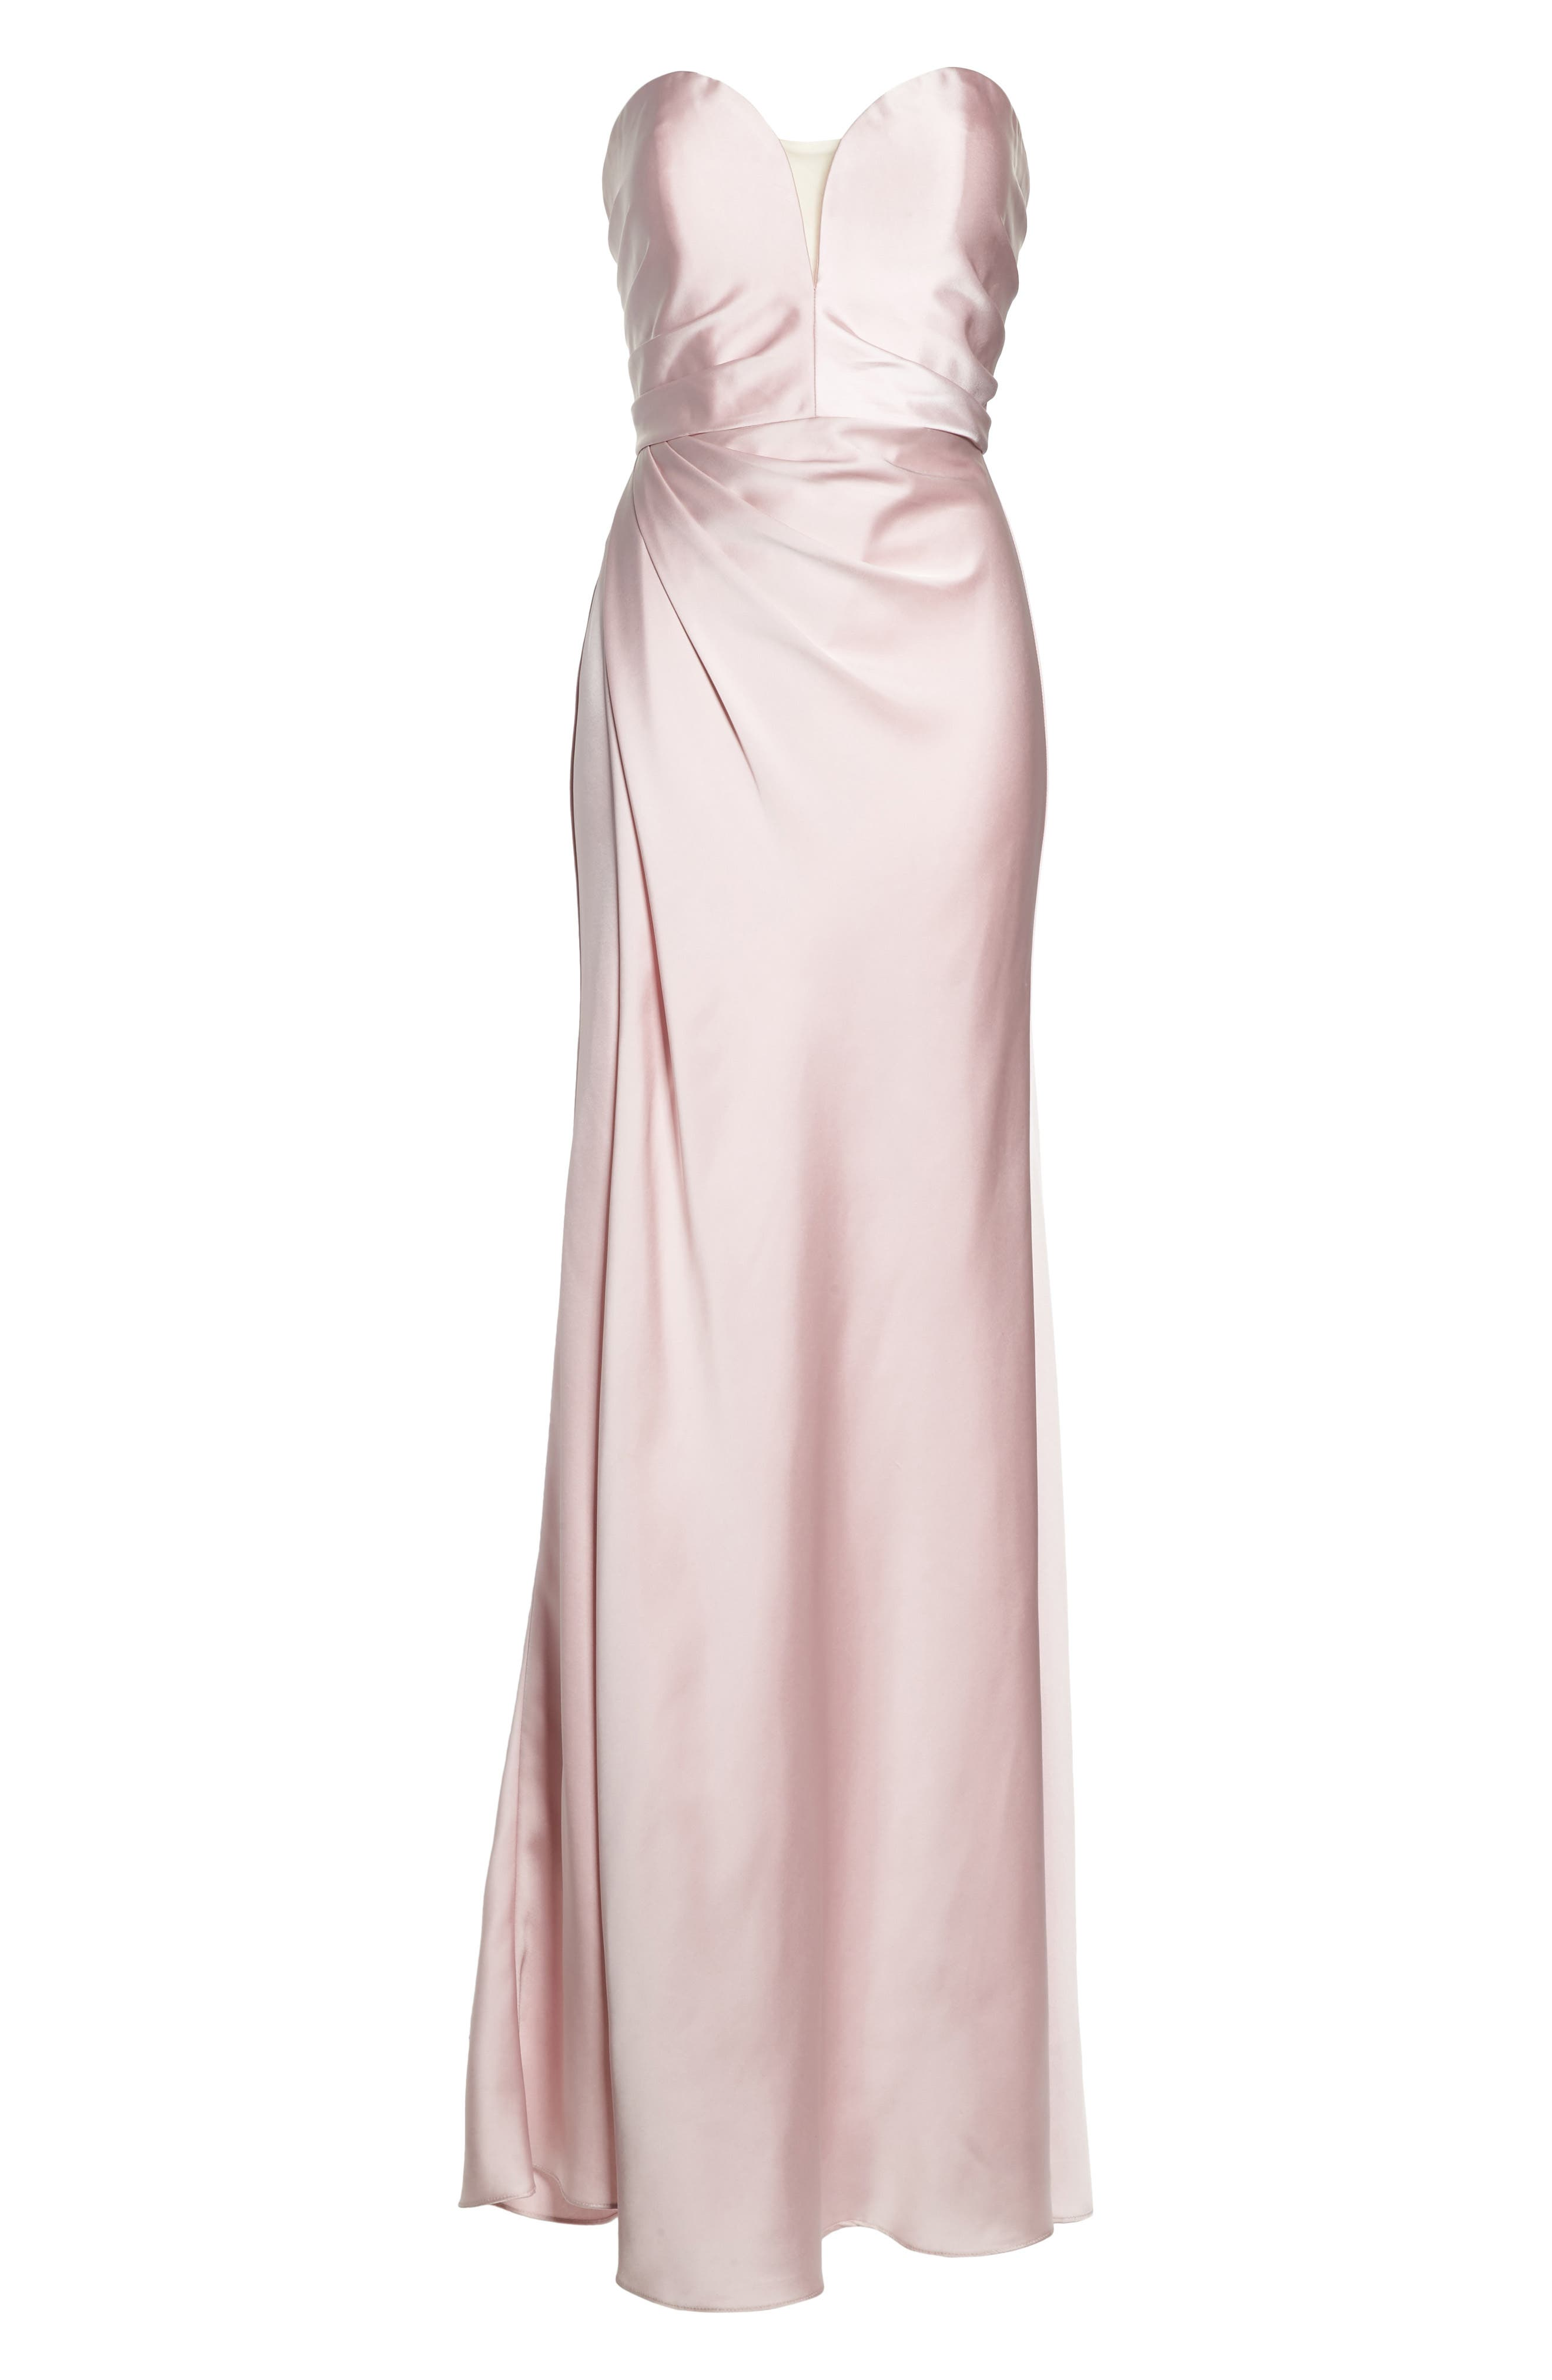 Gathered Strapless Satin Gown,                             Alternate thumbnail 6, color,                             Blush